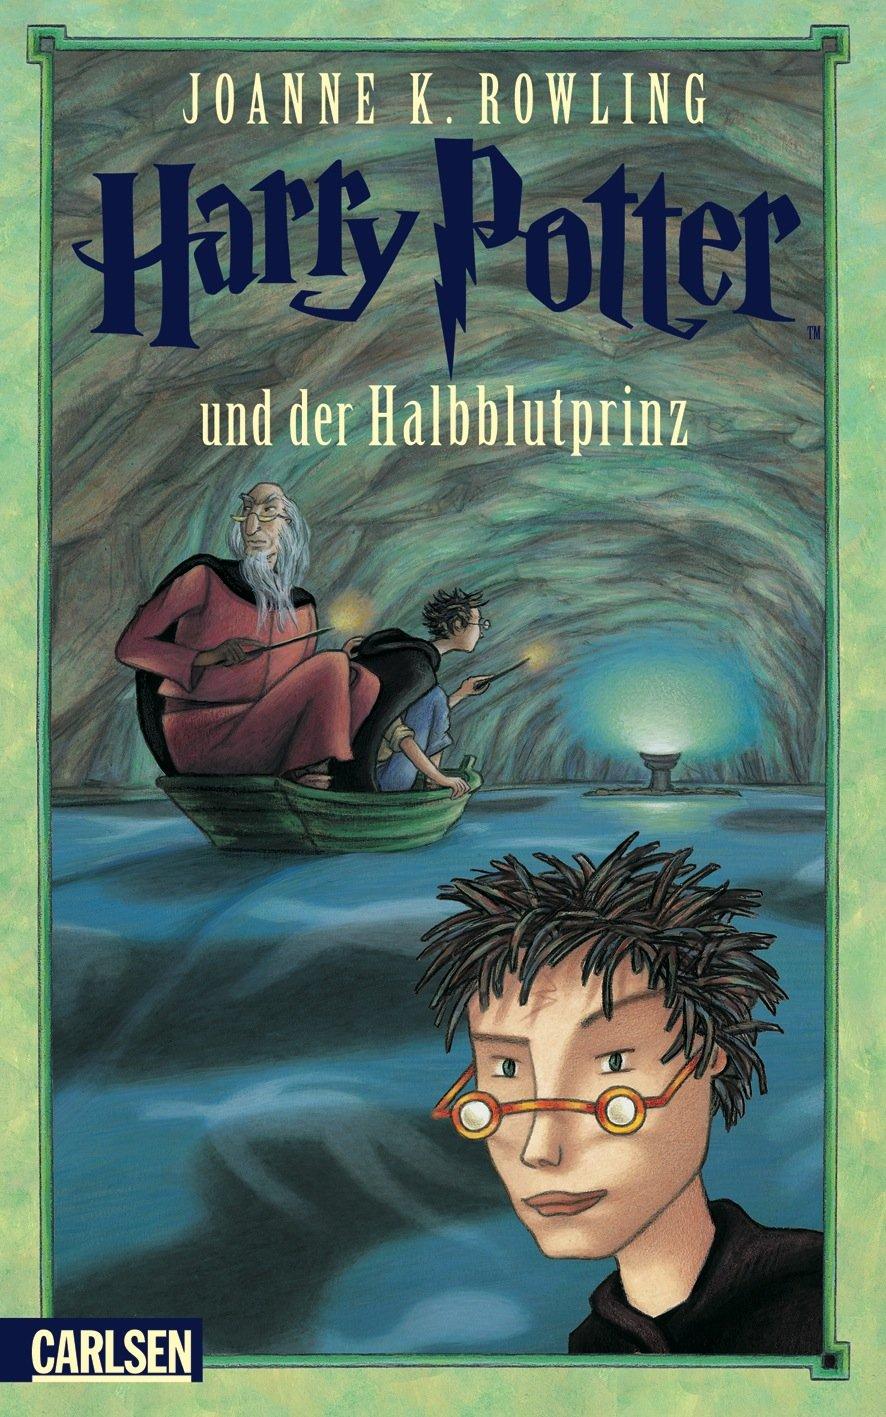 Harry Potter Band 6 Harry Potter Und Der Halbblutprinz Amazon De Rowling Joanne K Fritz Klaus Bucher